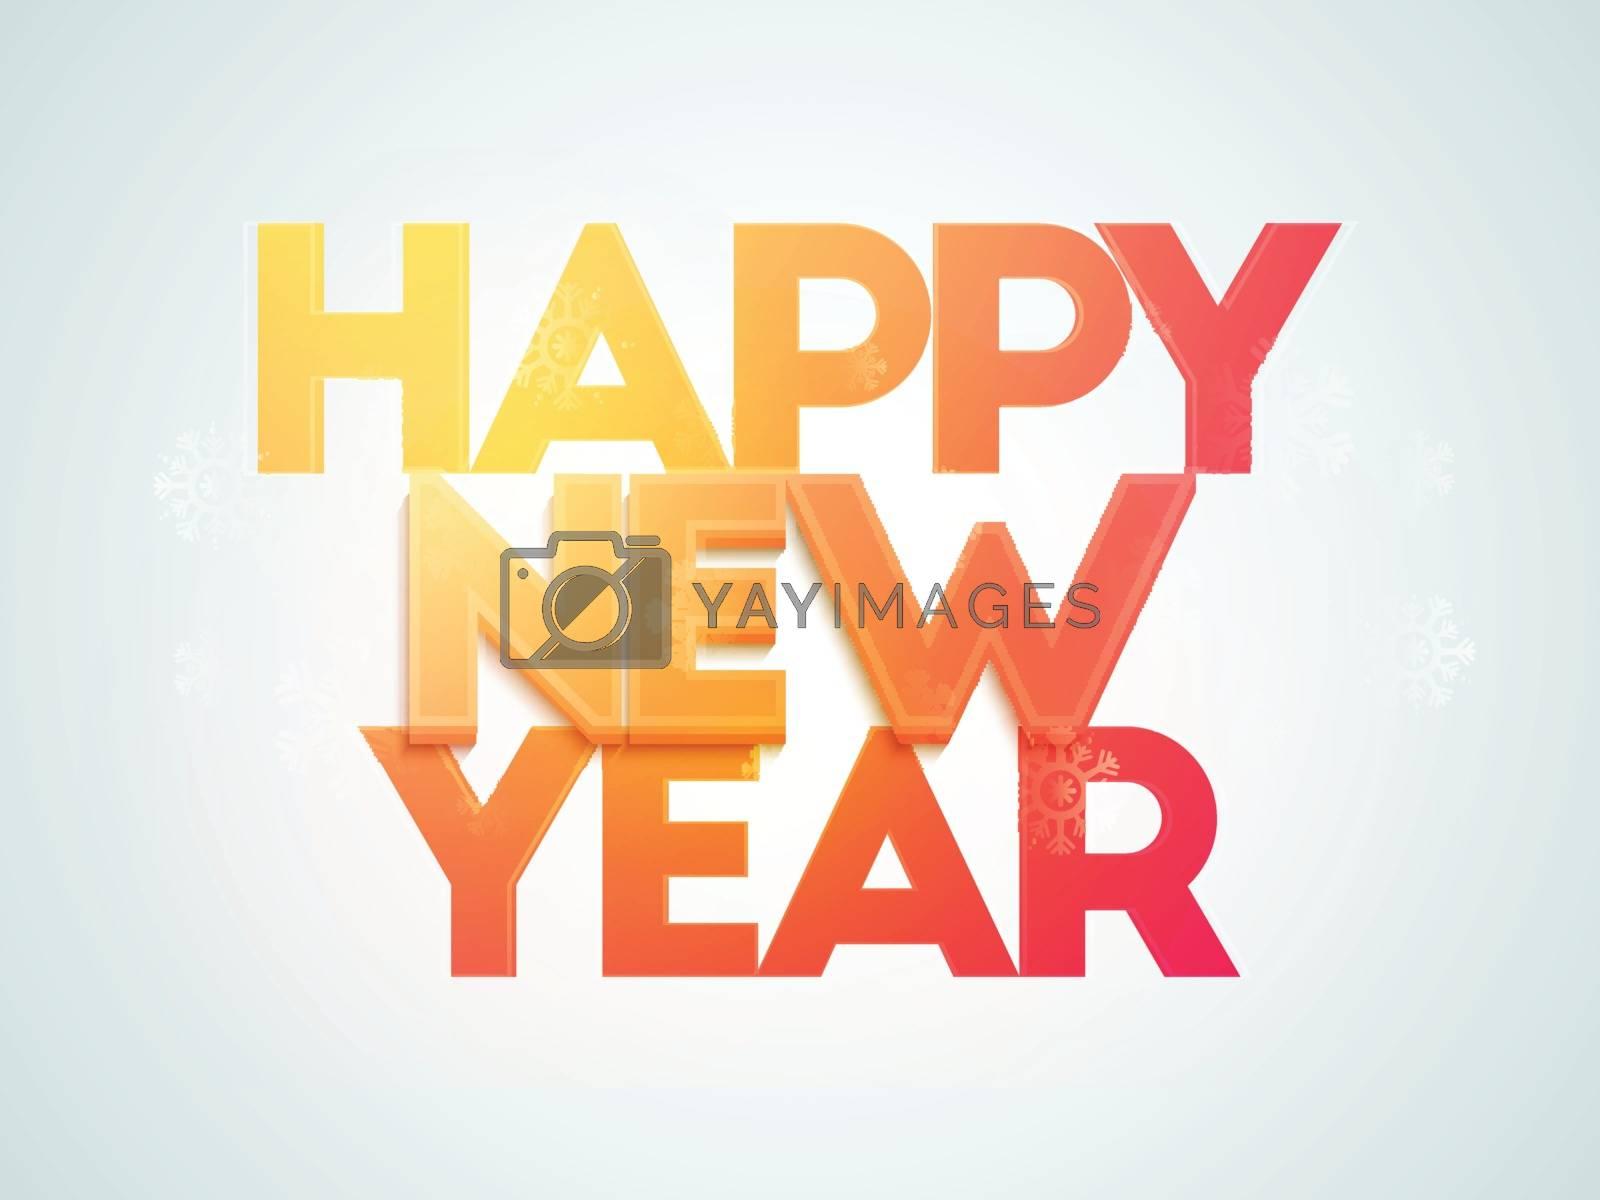 Elegant greeting card design for Happy New Year celebration.